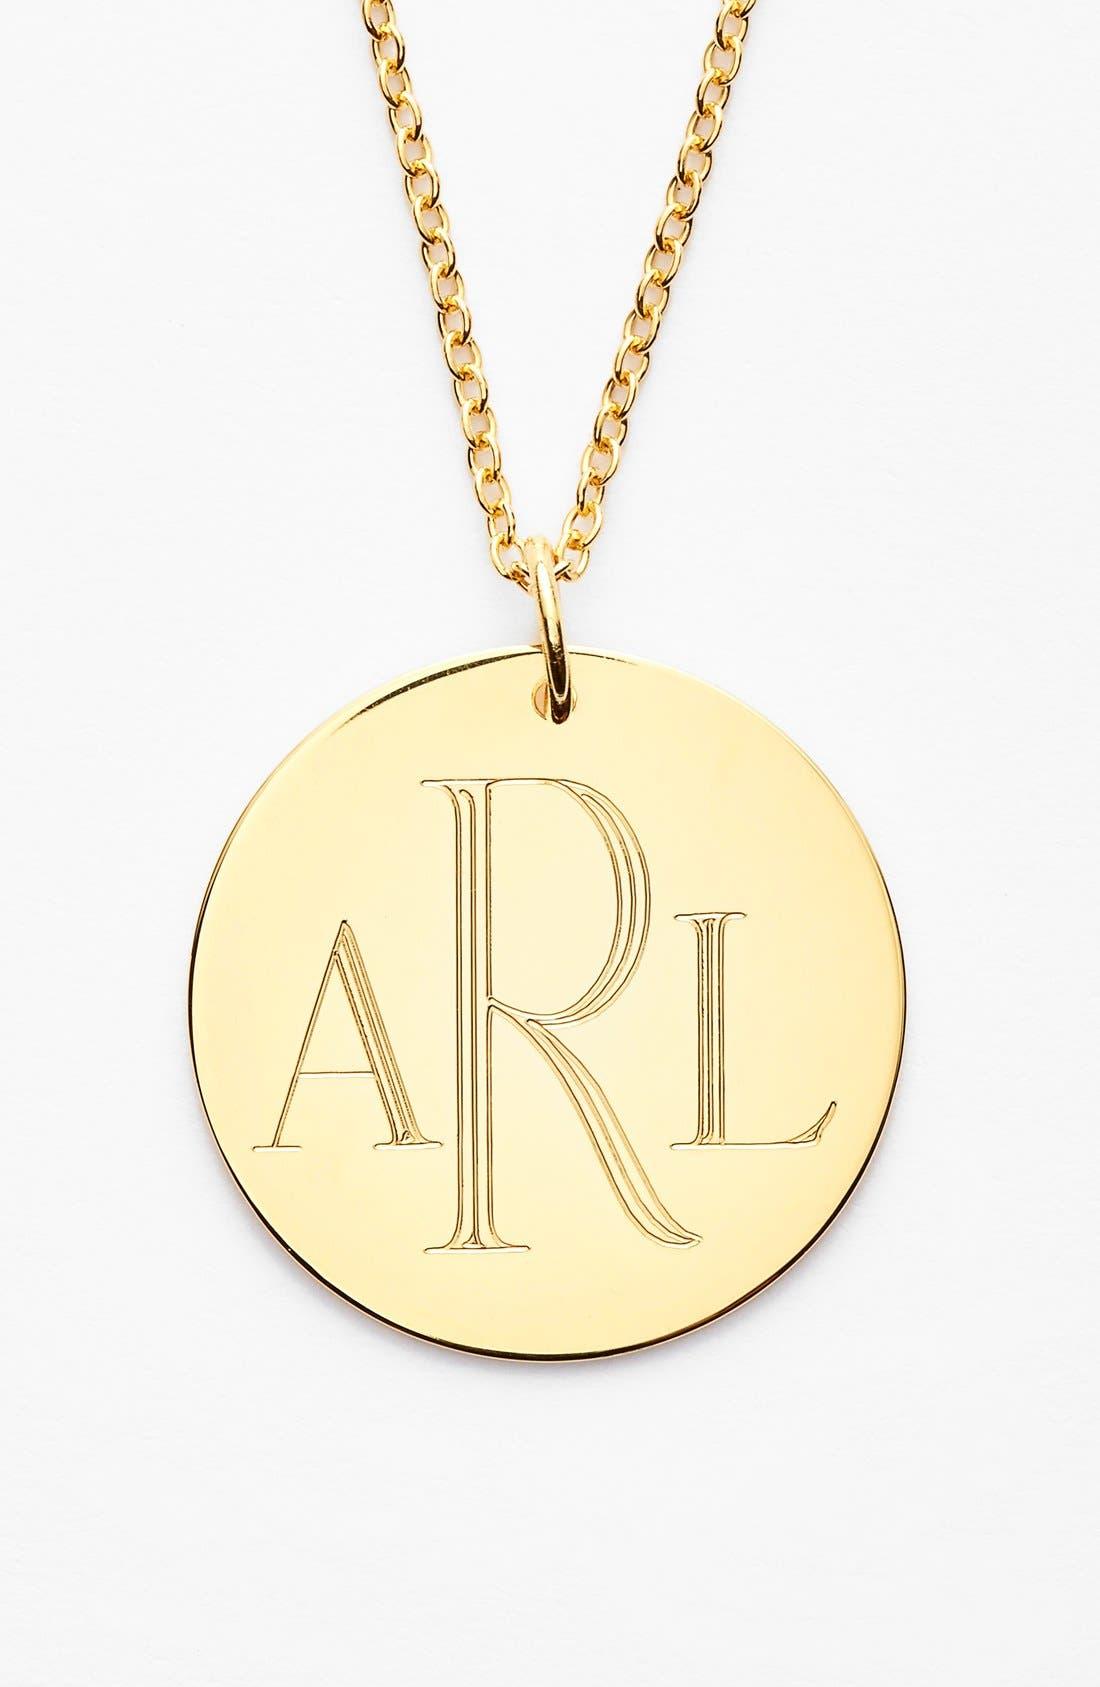 Personalized Reversible Pendant Necklace,                             Alternate thumbnail 2, color,                             Gold